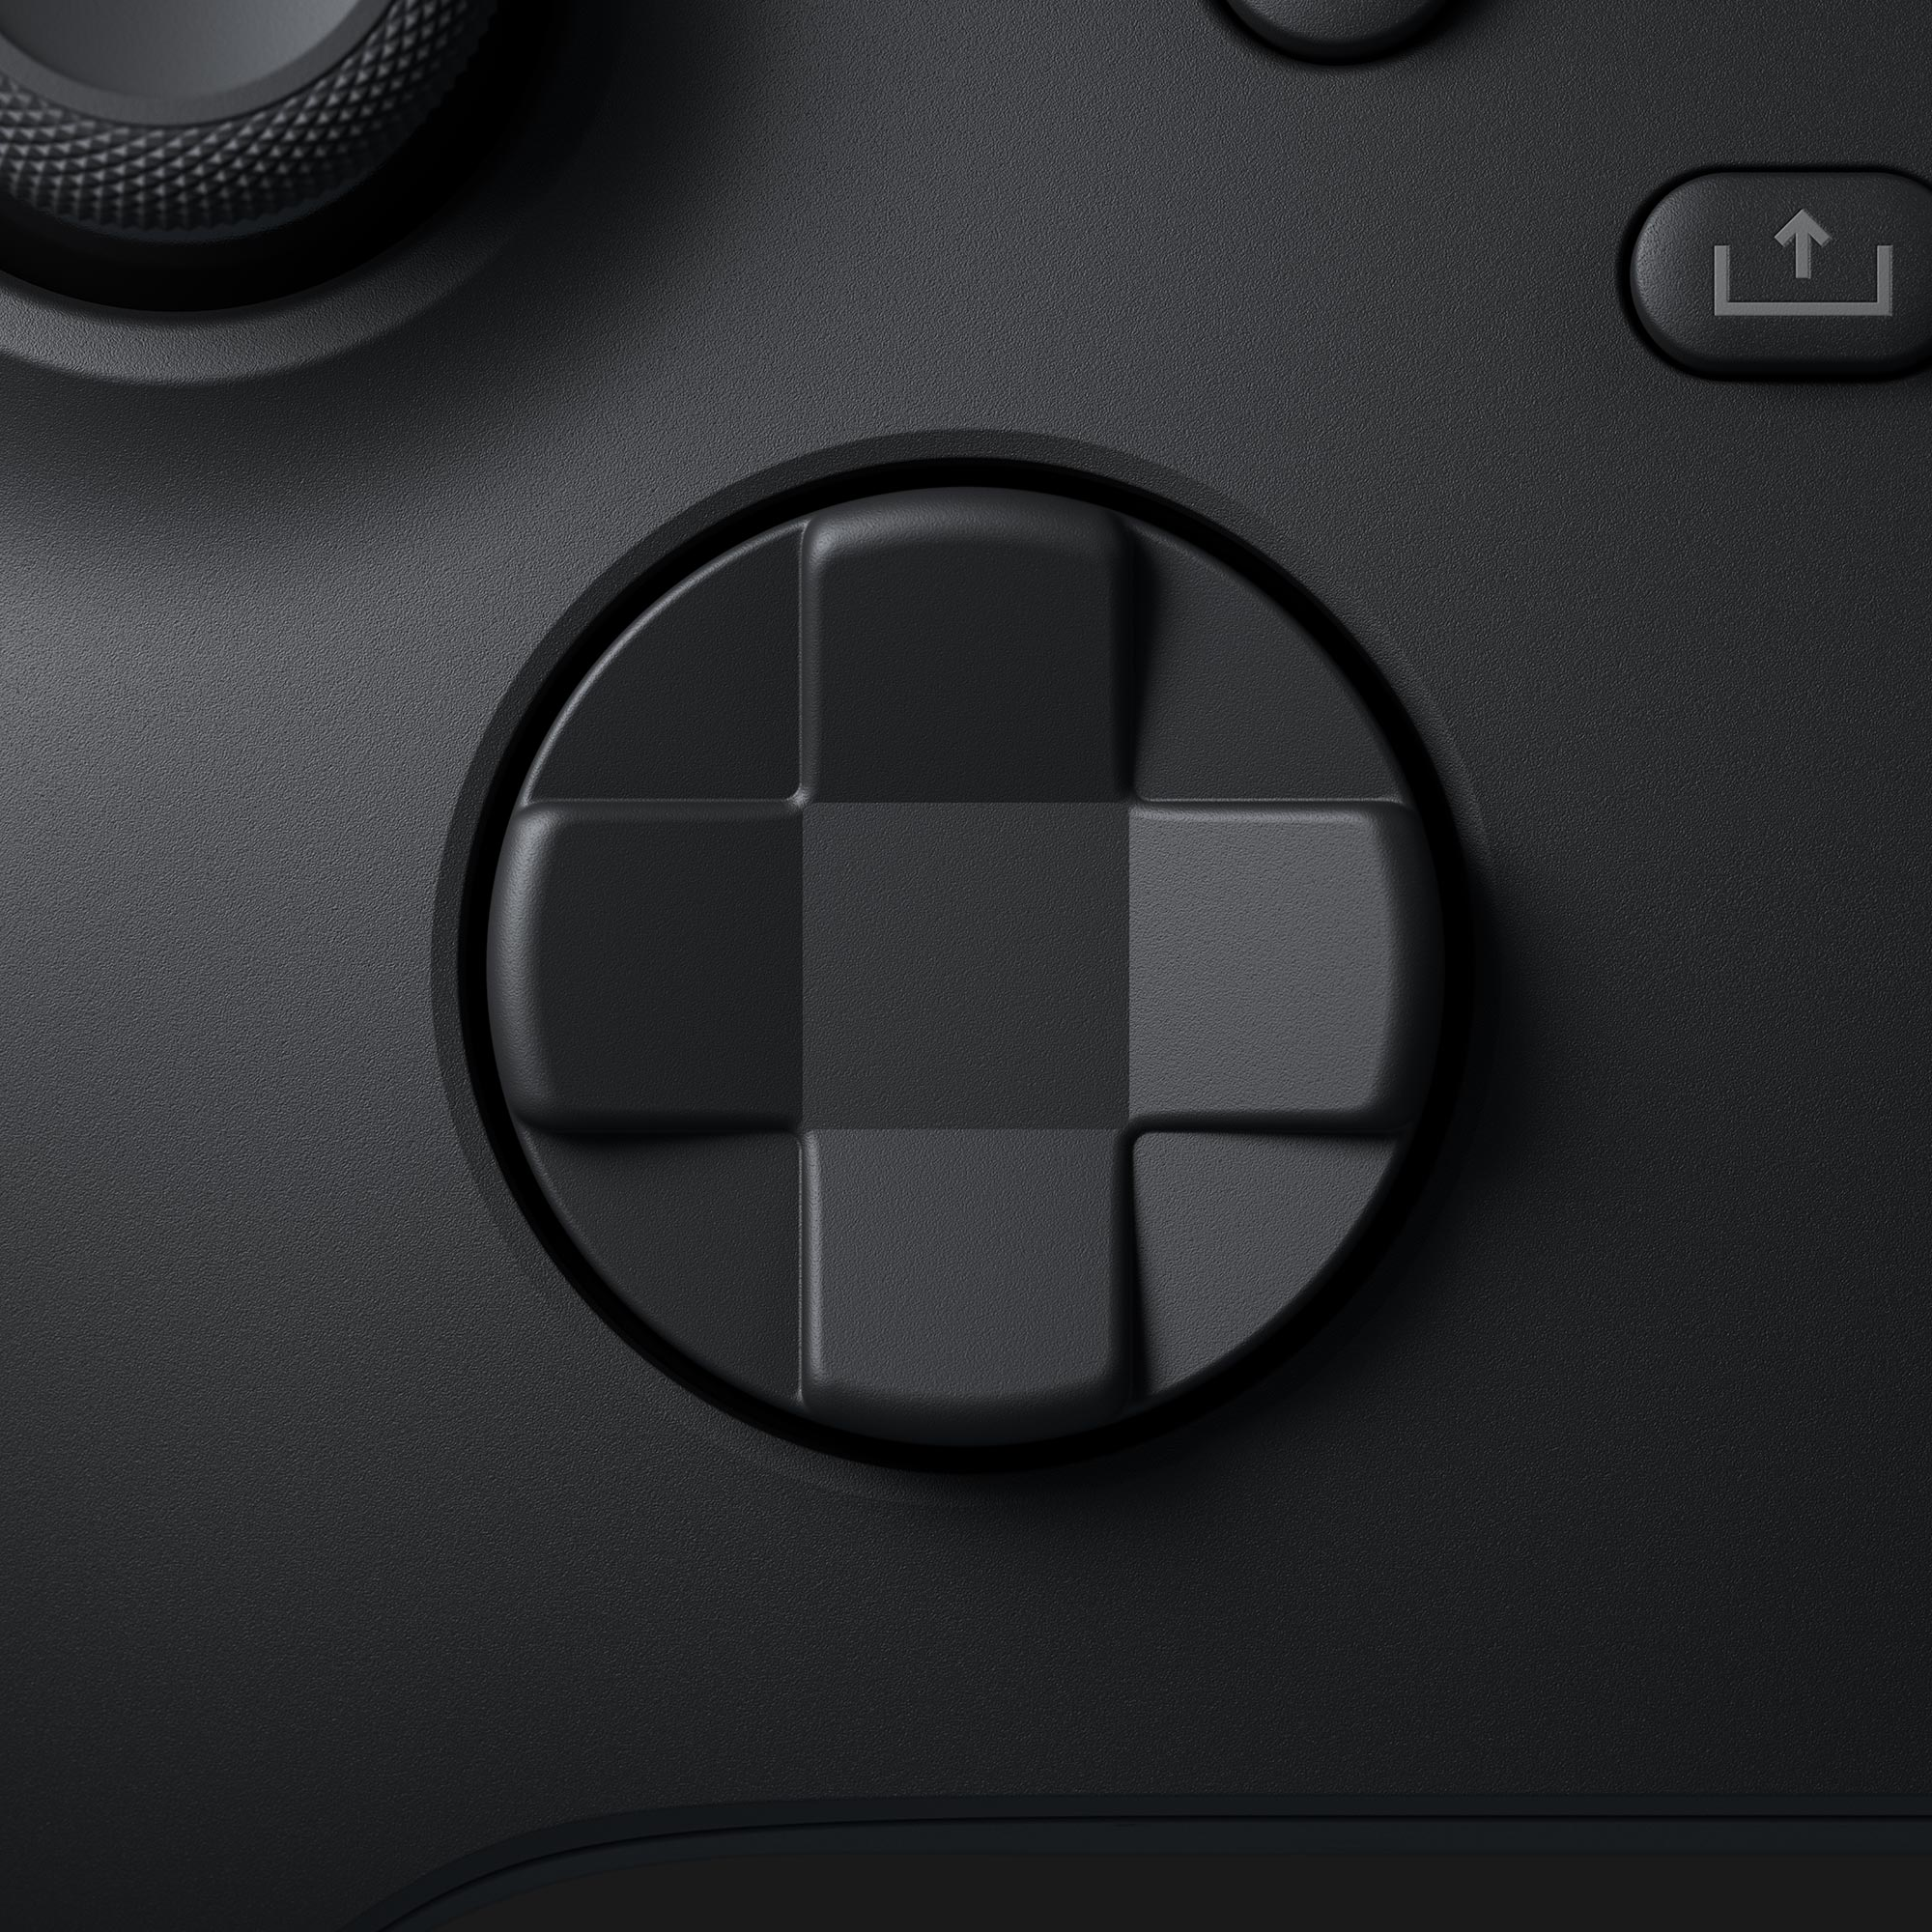 xbox-series-x-gamepad-5